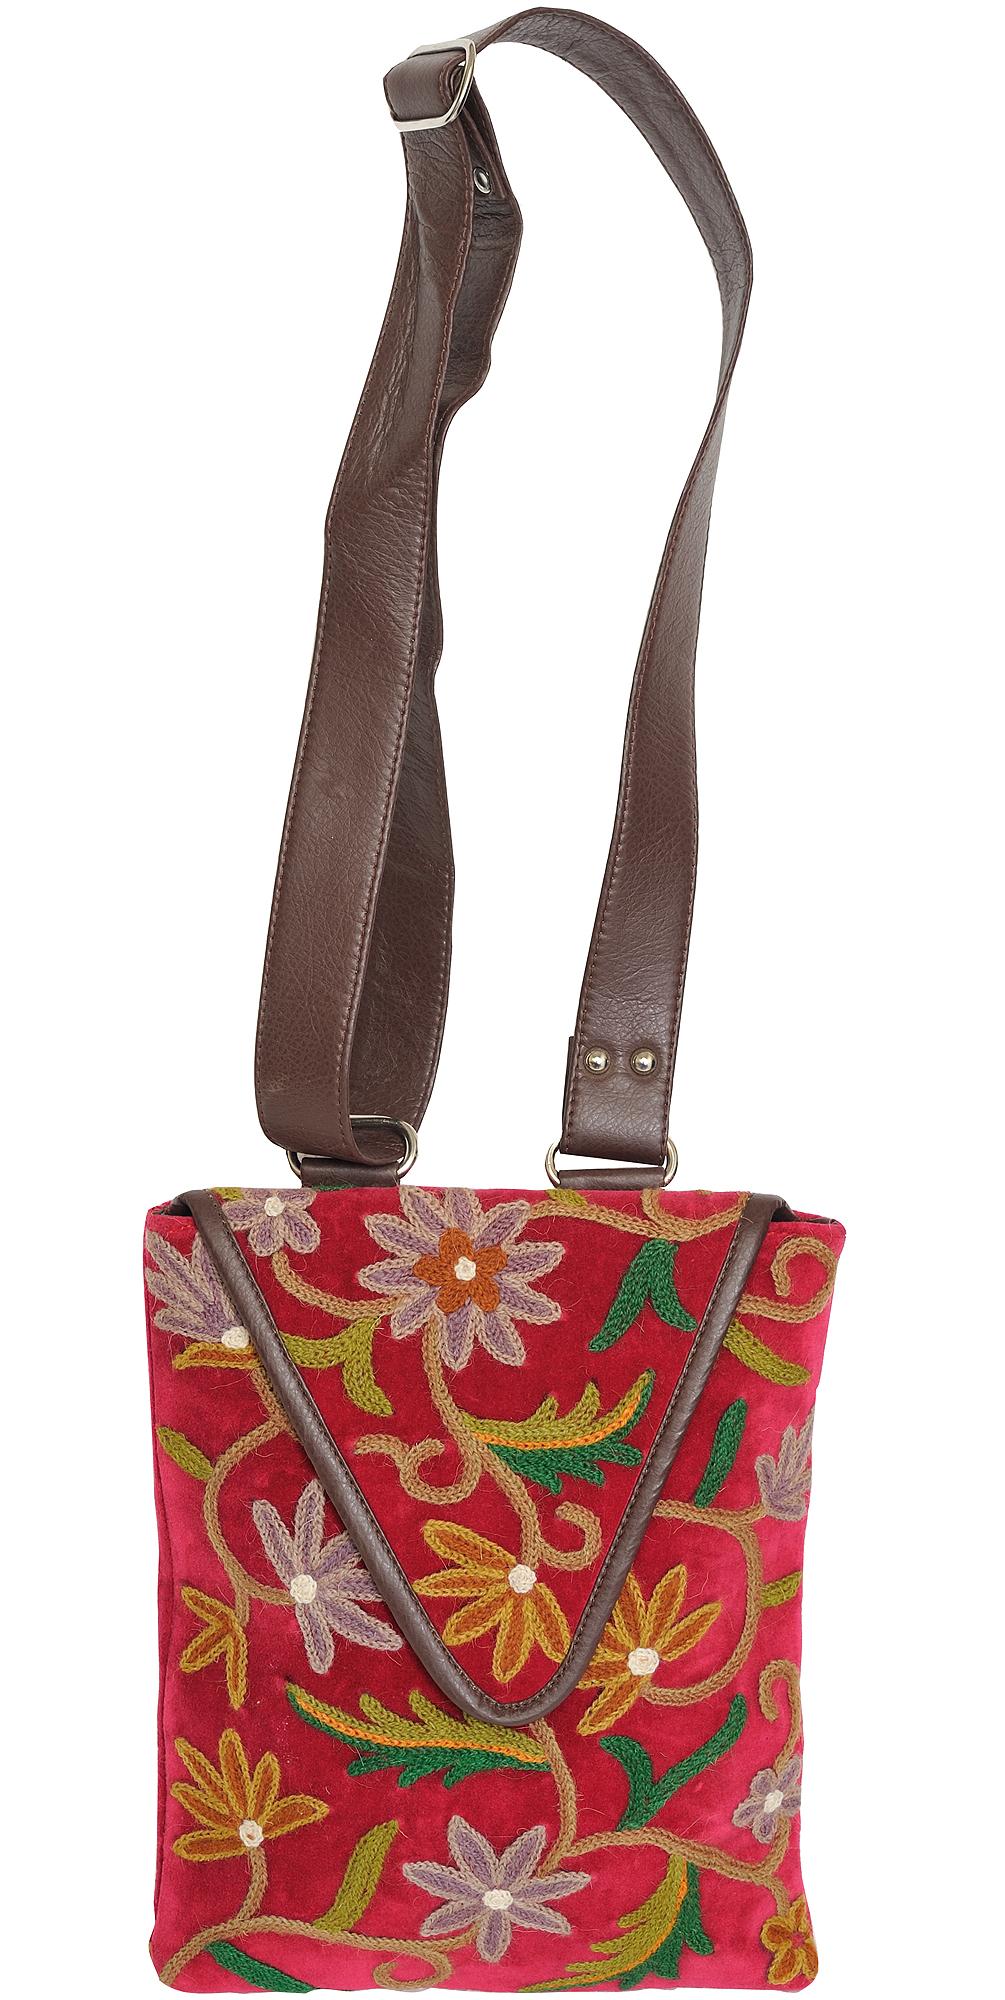 Raspberry wine shoulder bag from kashmir with floral